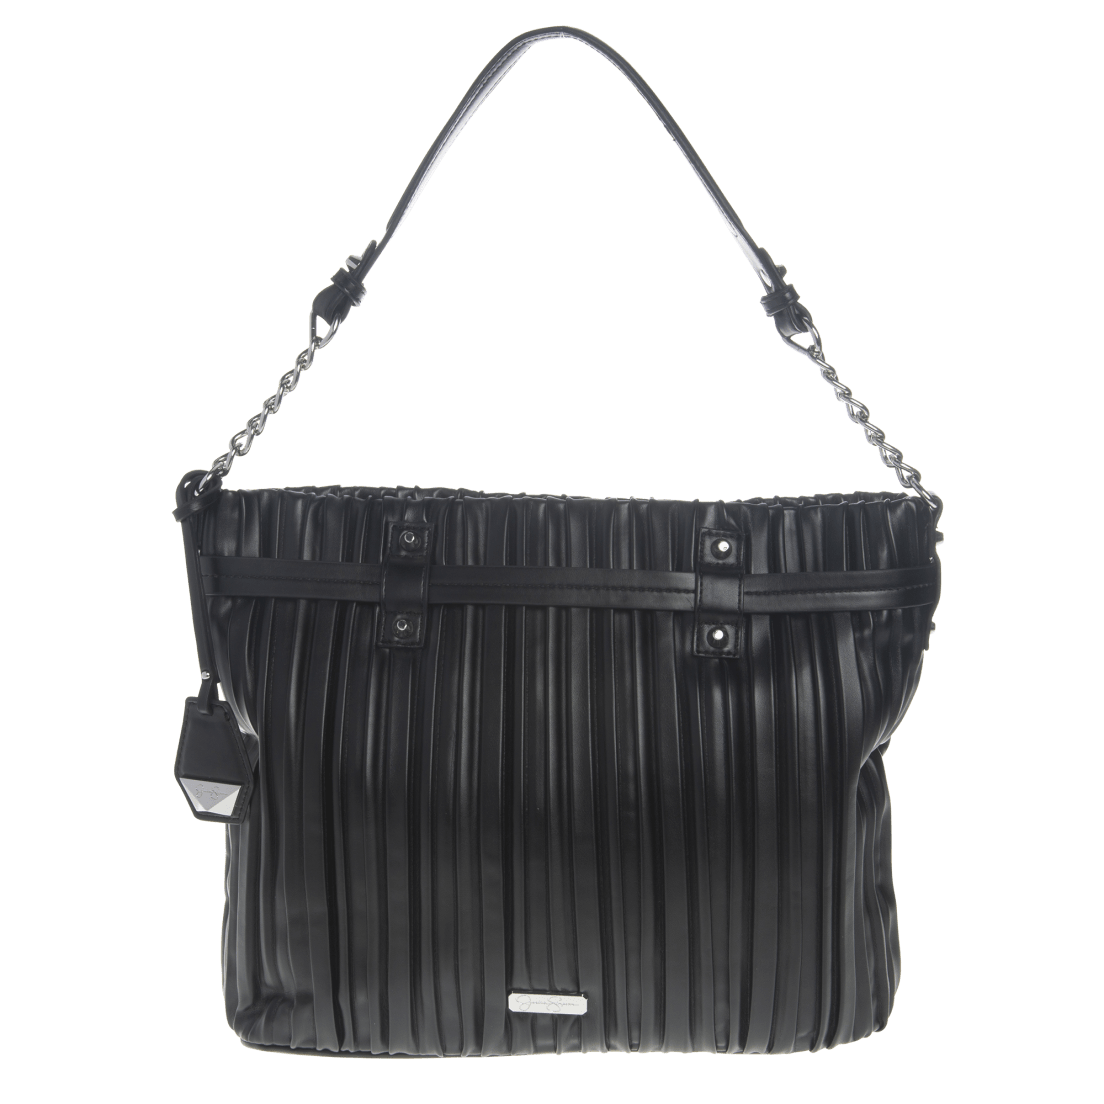 6224644f2f252 Jessica Simpson Becca Hobo Handbags